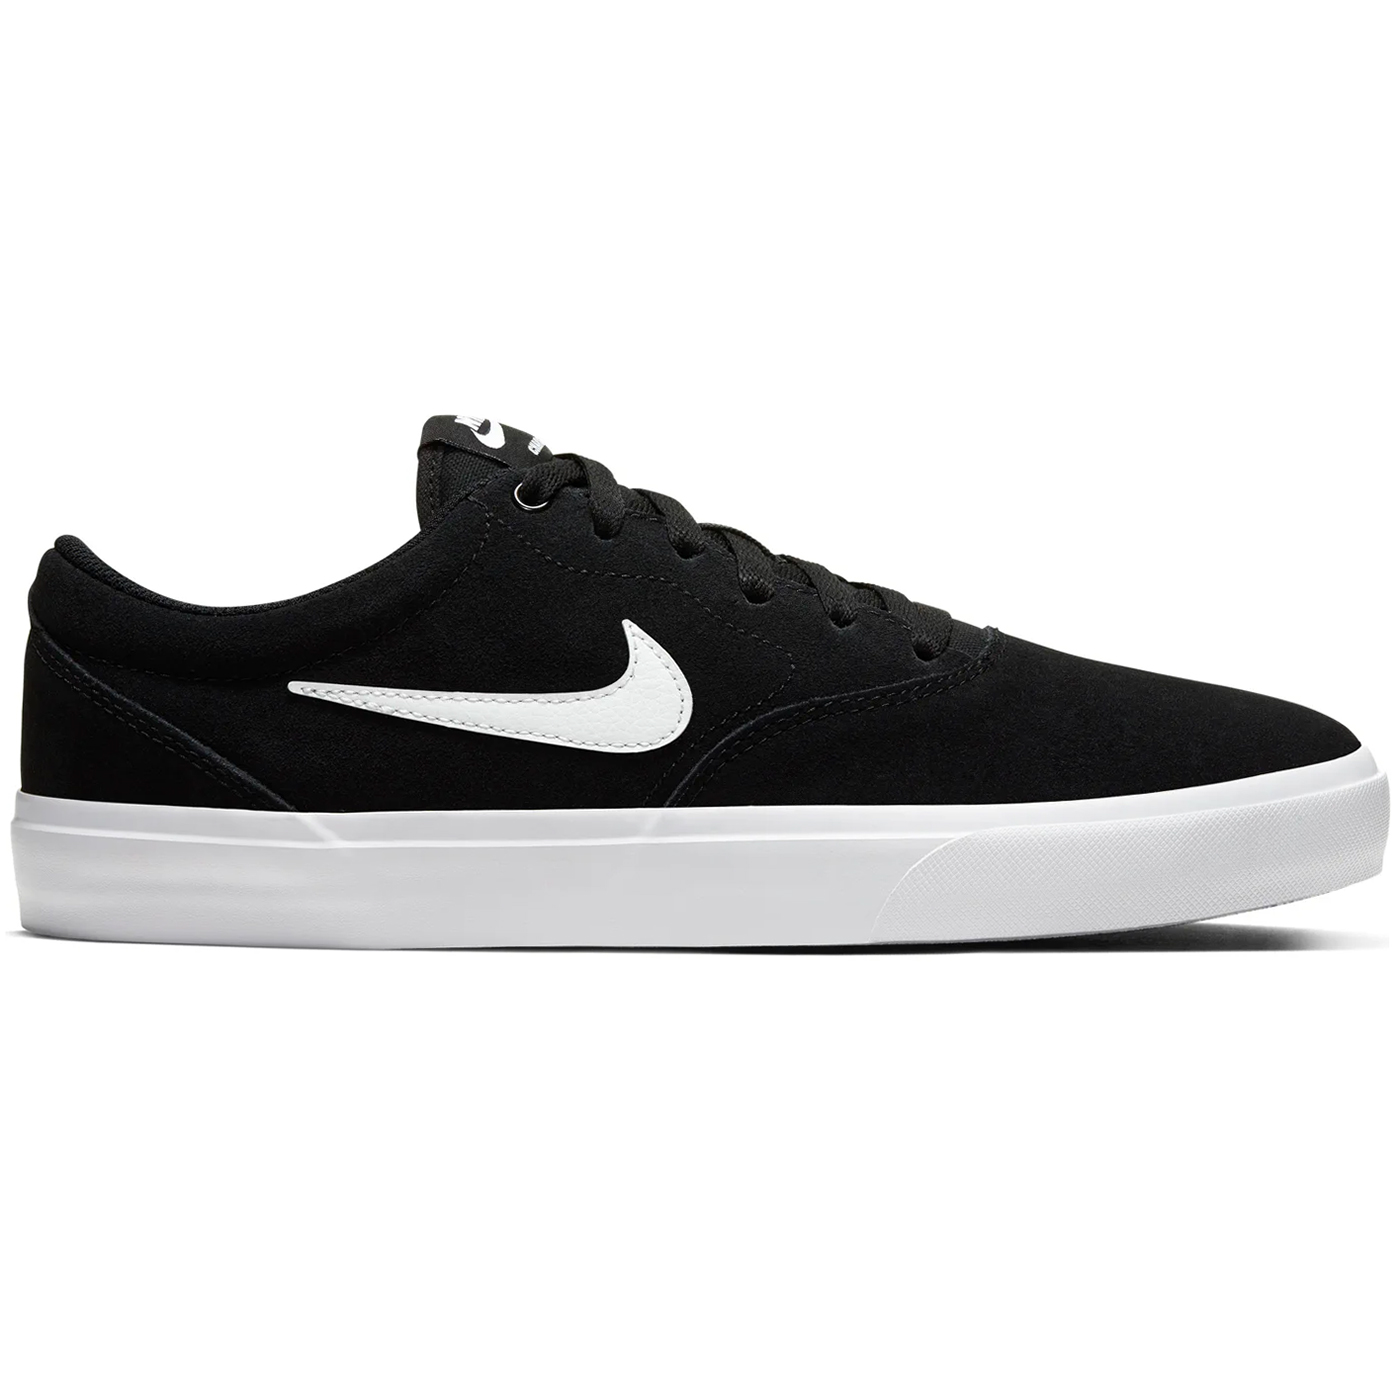 Nike SB Charge Suede Sneaker Skateschuh schwarz weiß